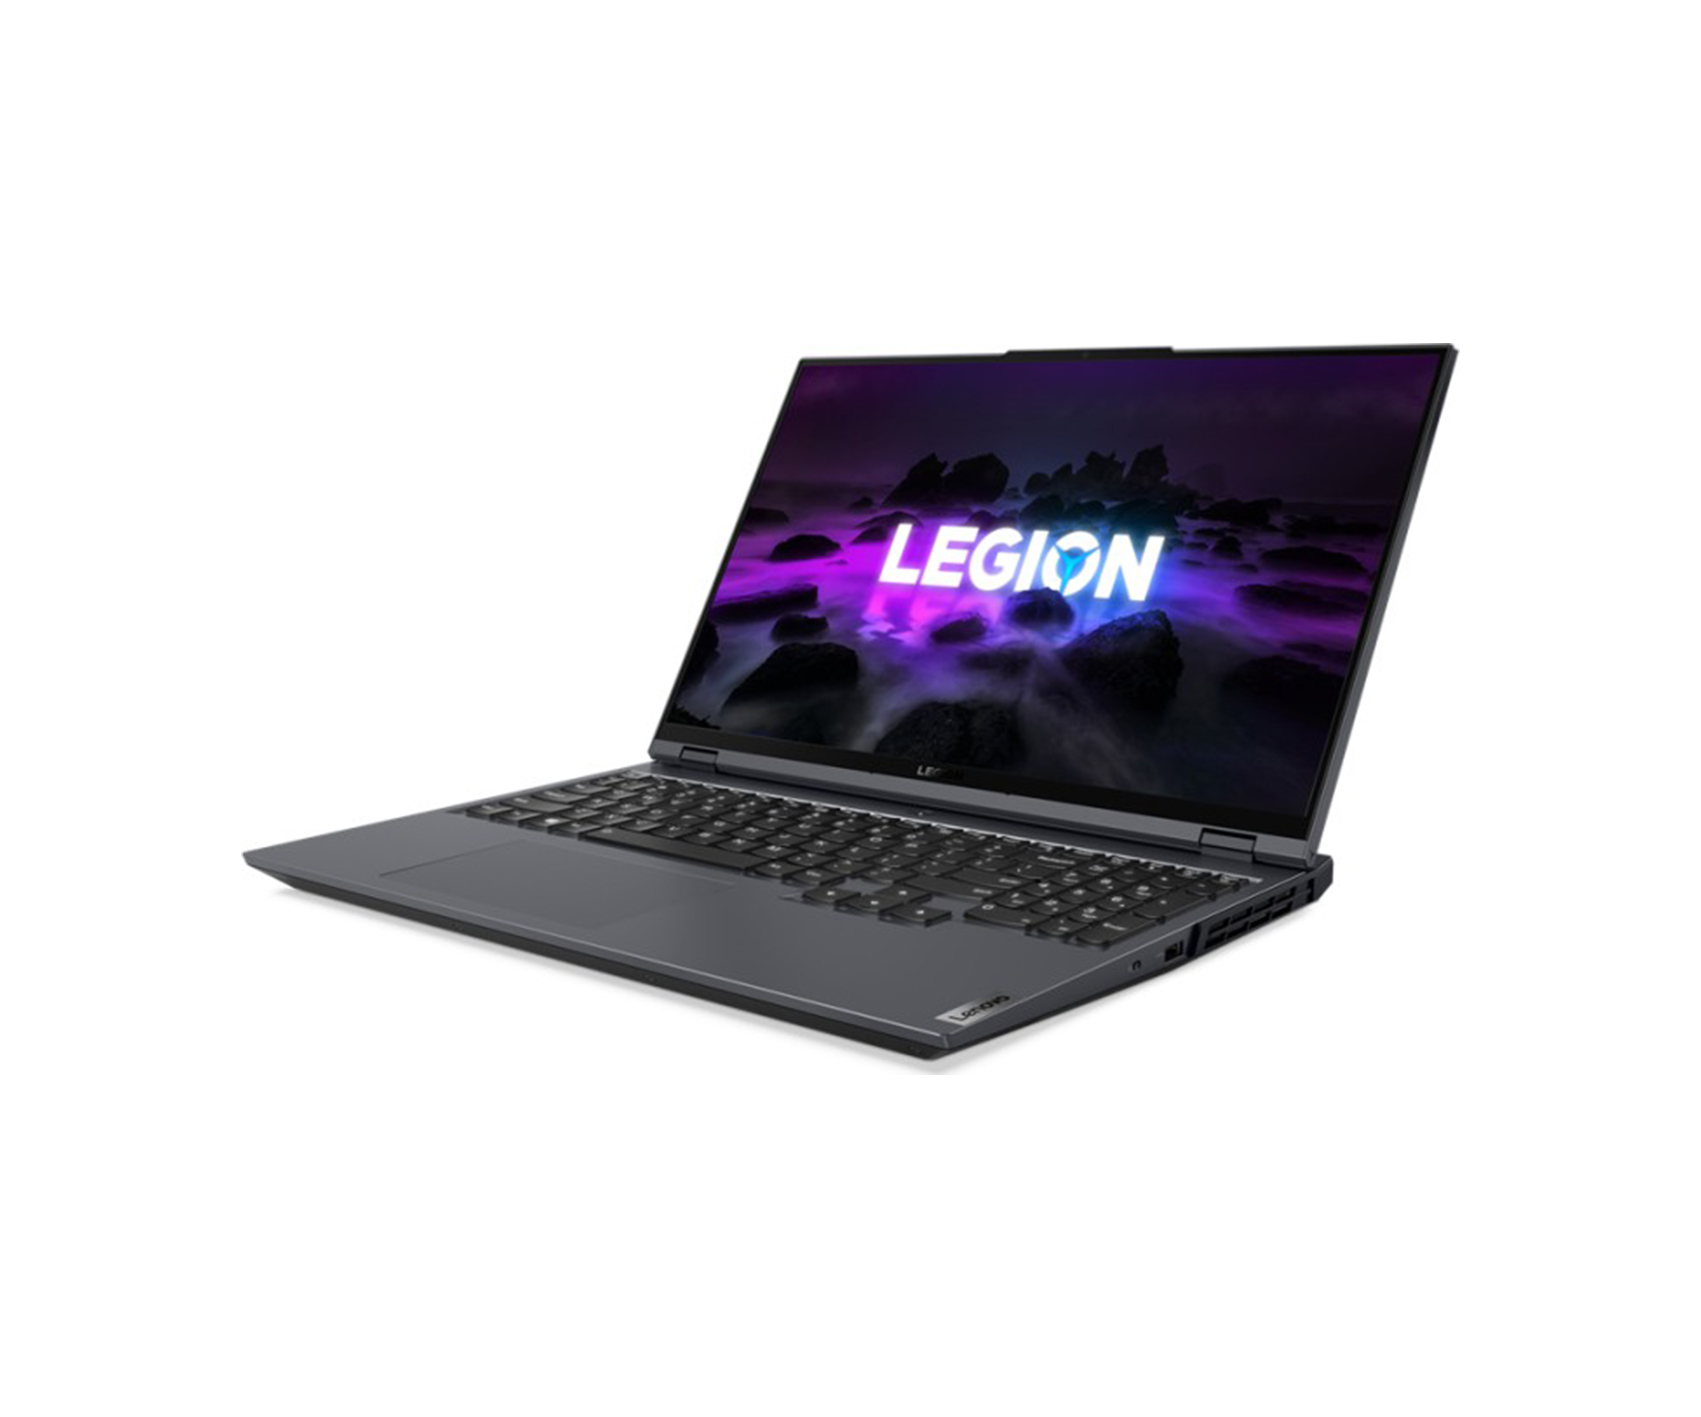 "Lenovo Legion 5 Pro Laptop, 16.0"" IPS 165Hz, Ryzen 7 5800H, GeForce RTX 3060 6GB, 16GB, 512GB SSD, Win 10 Home 82JQ006EUS"